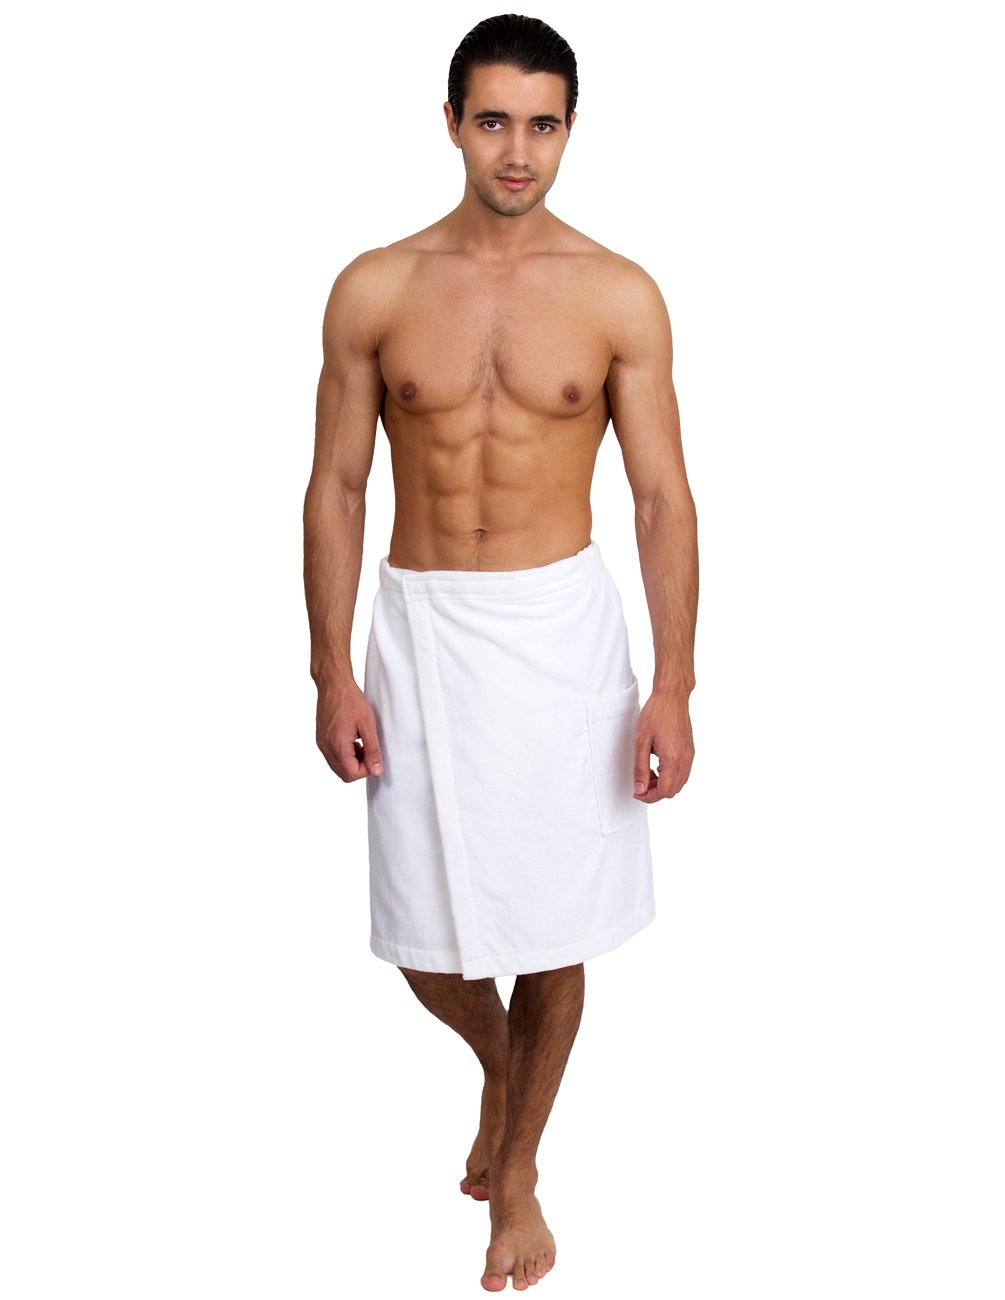 TowelSelections Men's Wrap, Shower & Bath, Terry Velour Towel Small/Medium White